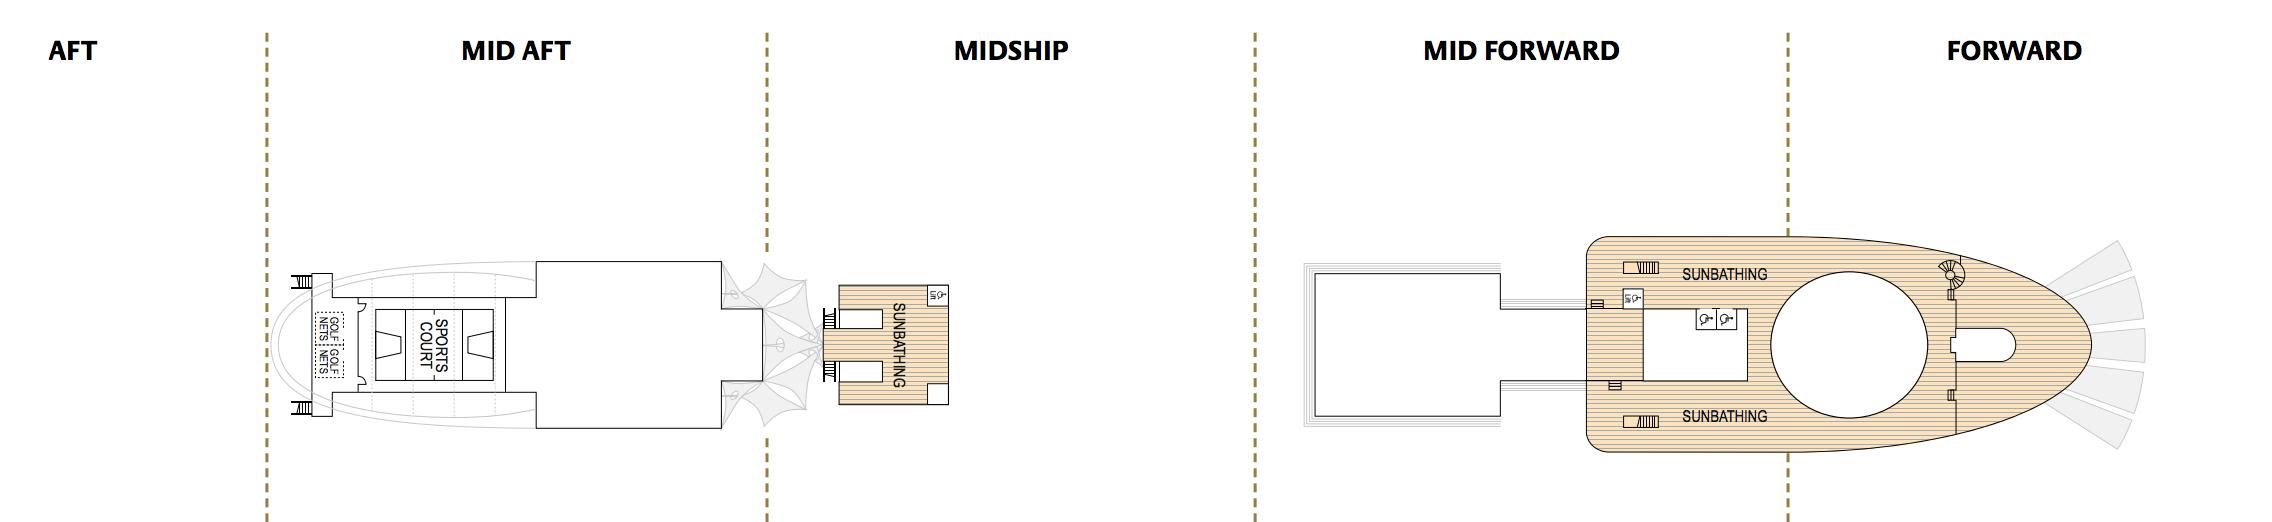 Arvia-deckplan-Deck 19 - Sky Deck